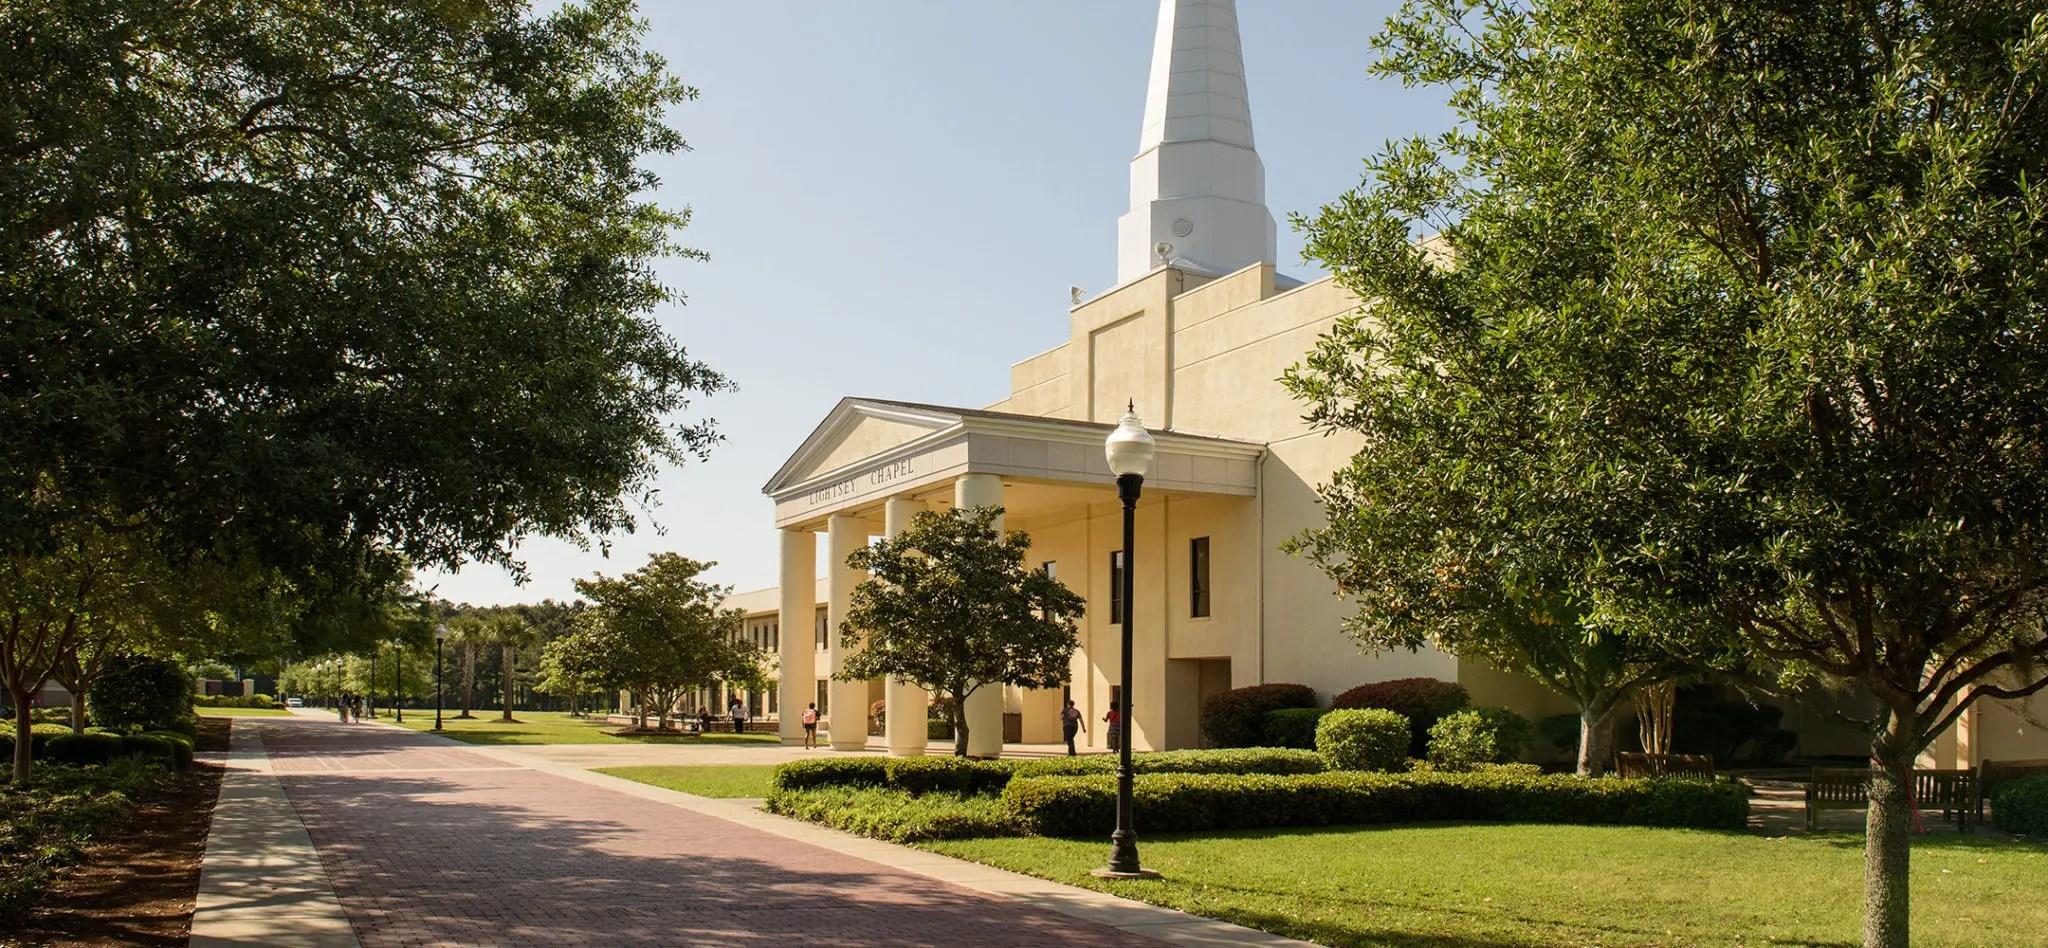 Charleston Southern University's Chapel, outside on a sunny day.